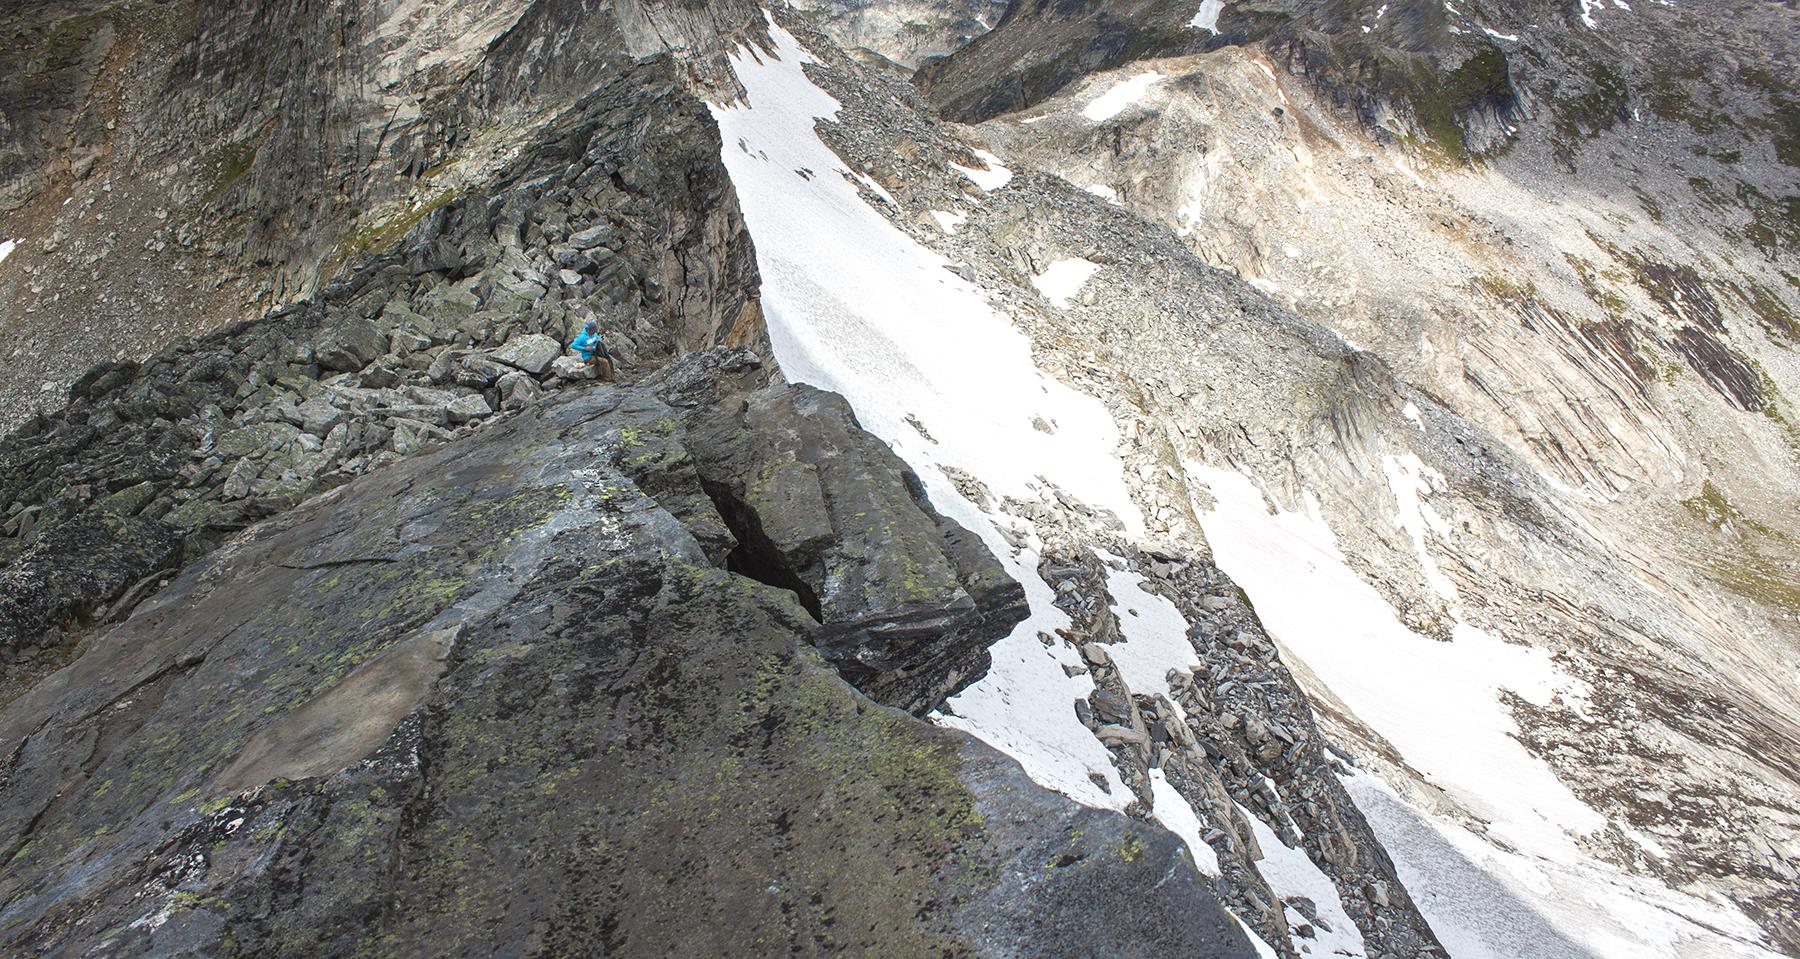 A snow covered mountain ridge.